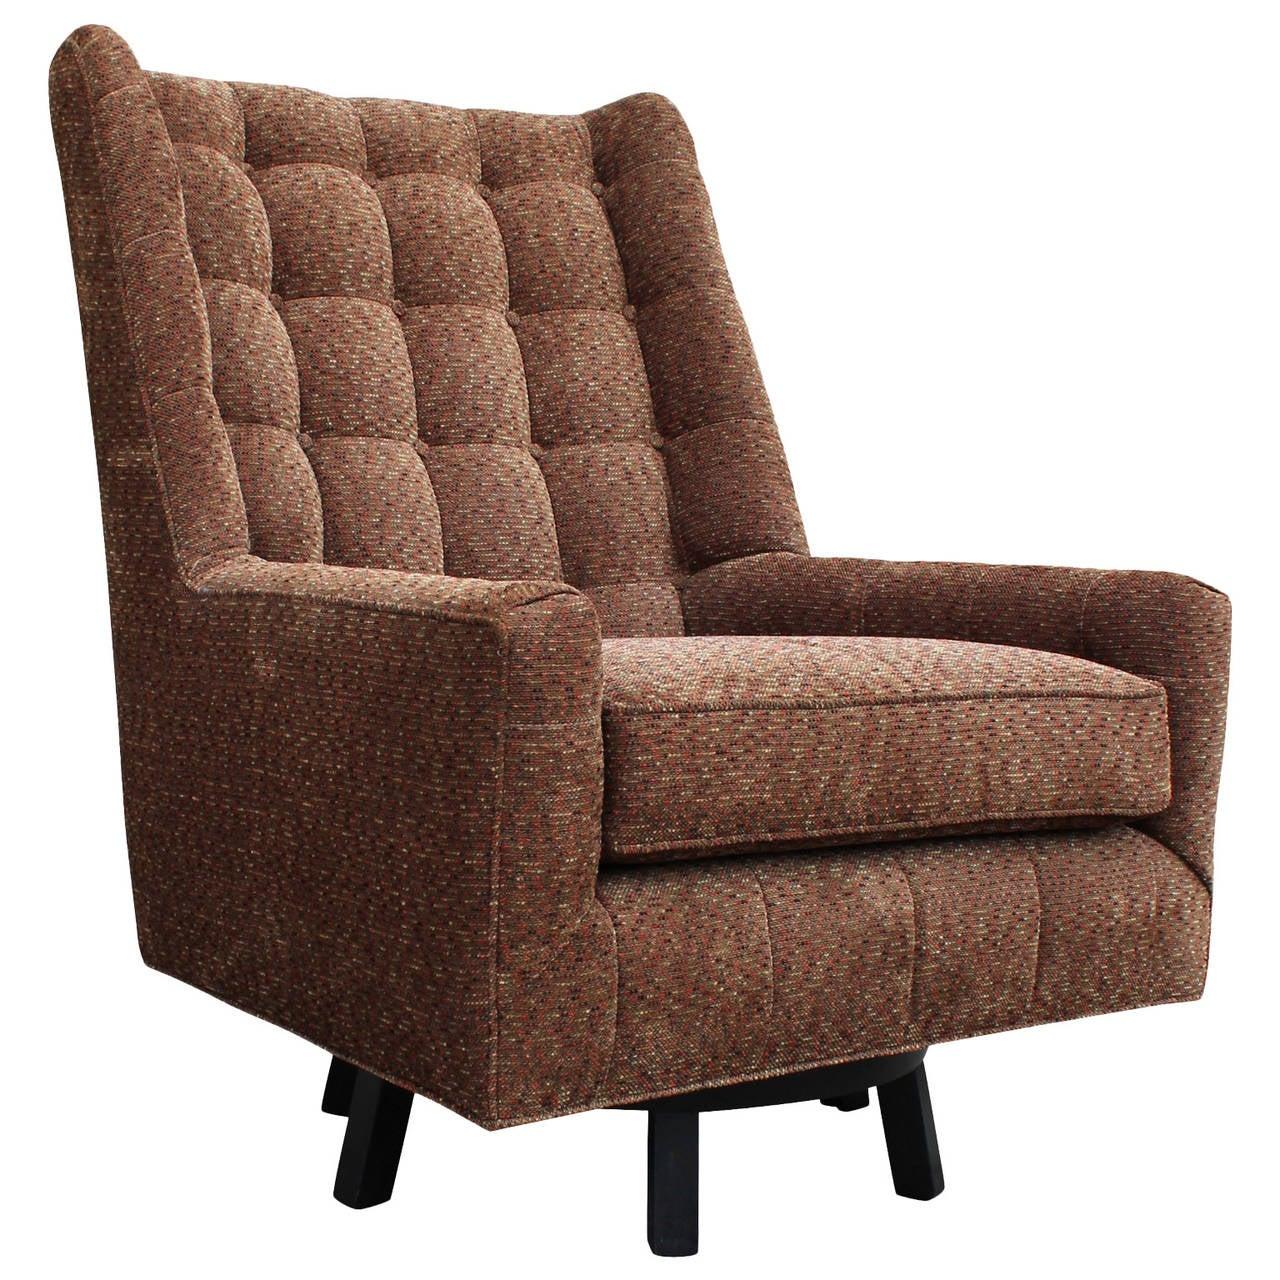 swivel lounge chairs sears patio chair covers harvey probber